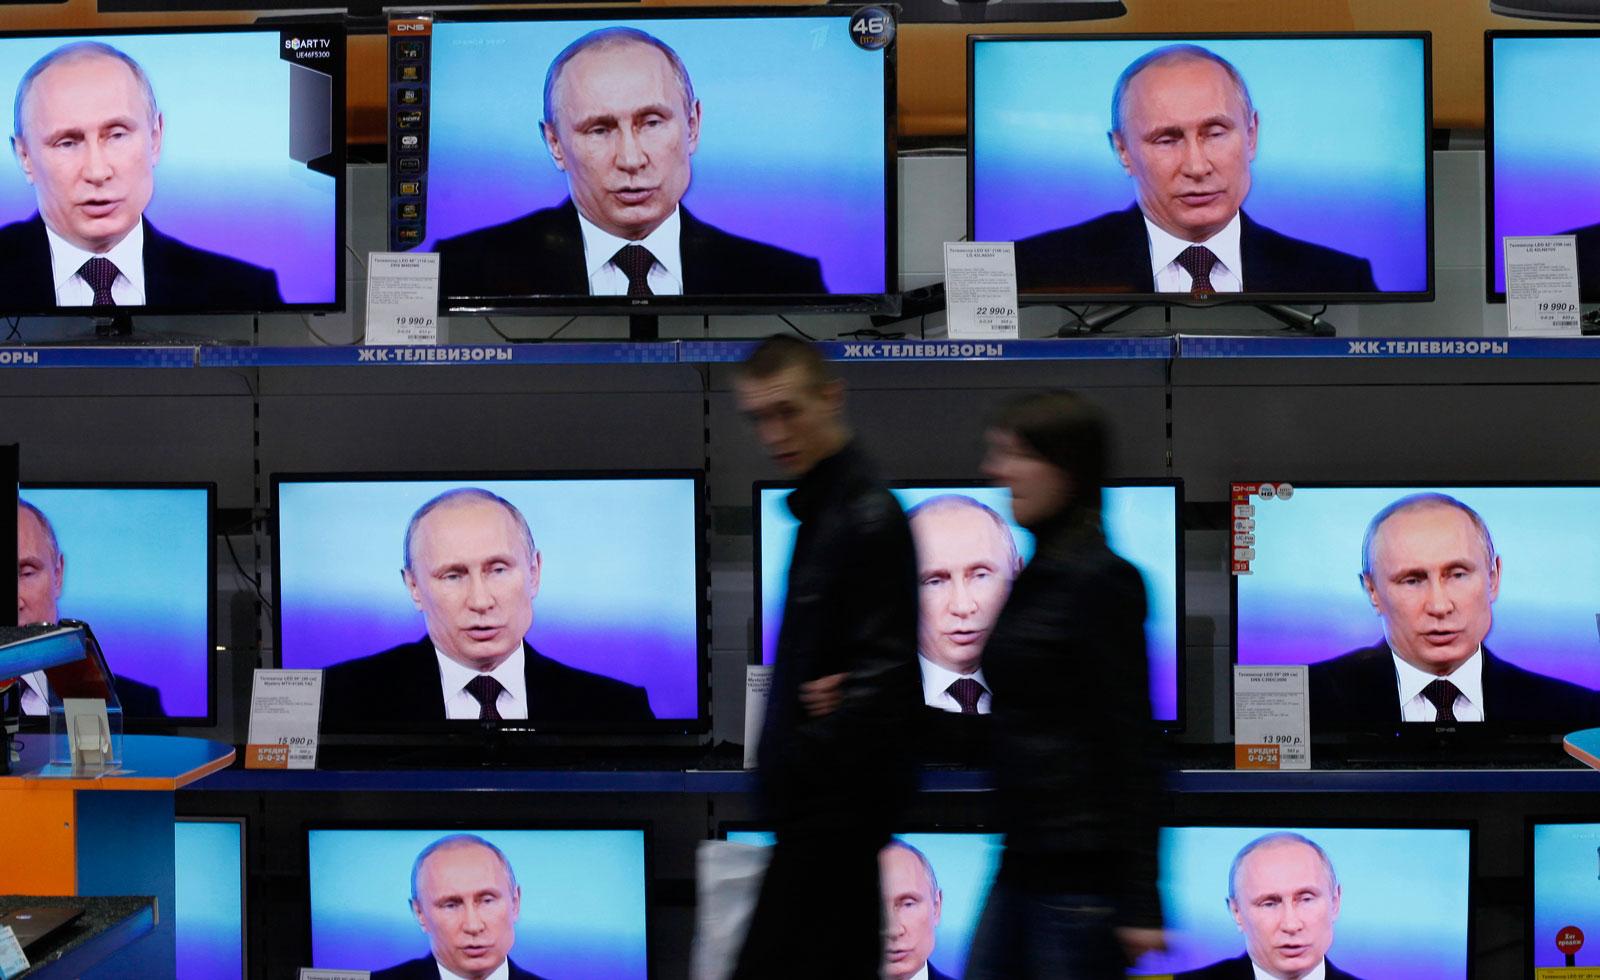 Vladimir Putin on television screens in Krasnoyarsk, Russia, April 17, 2014